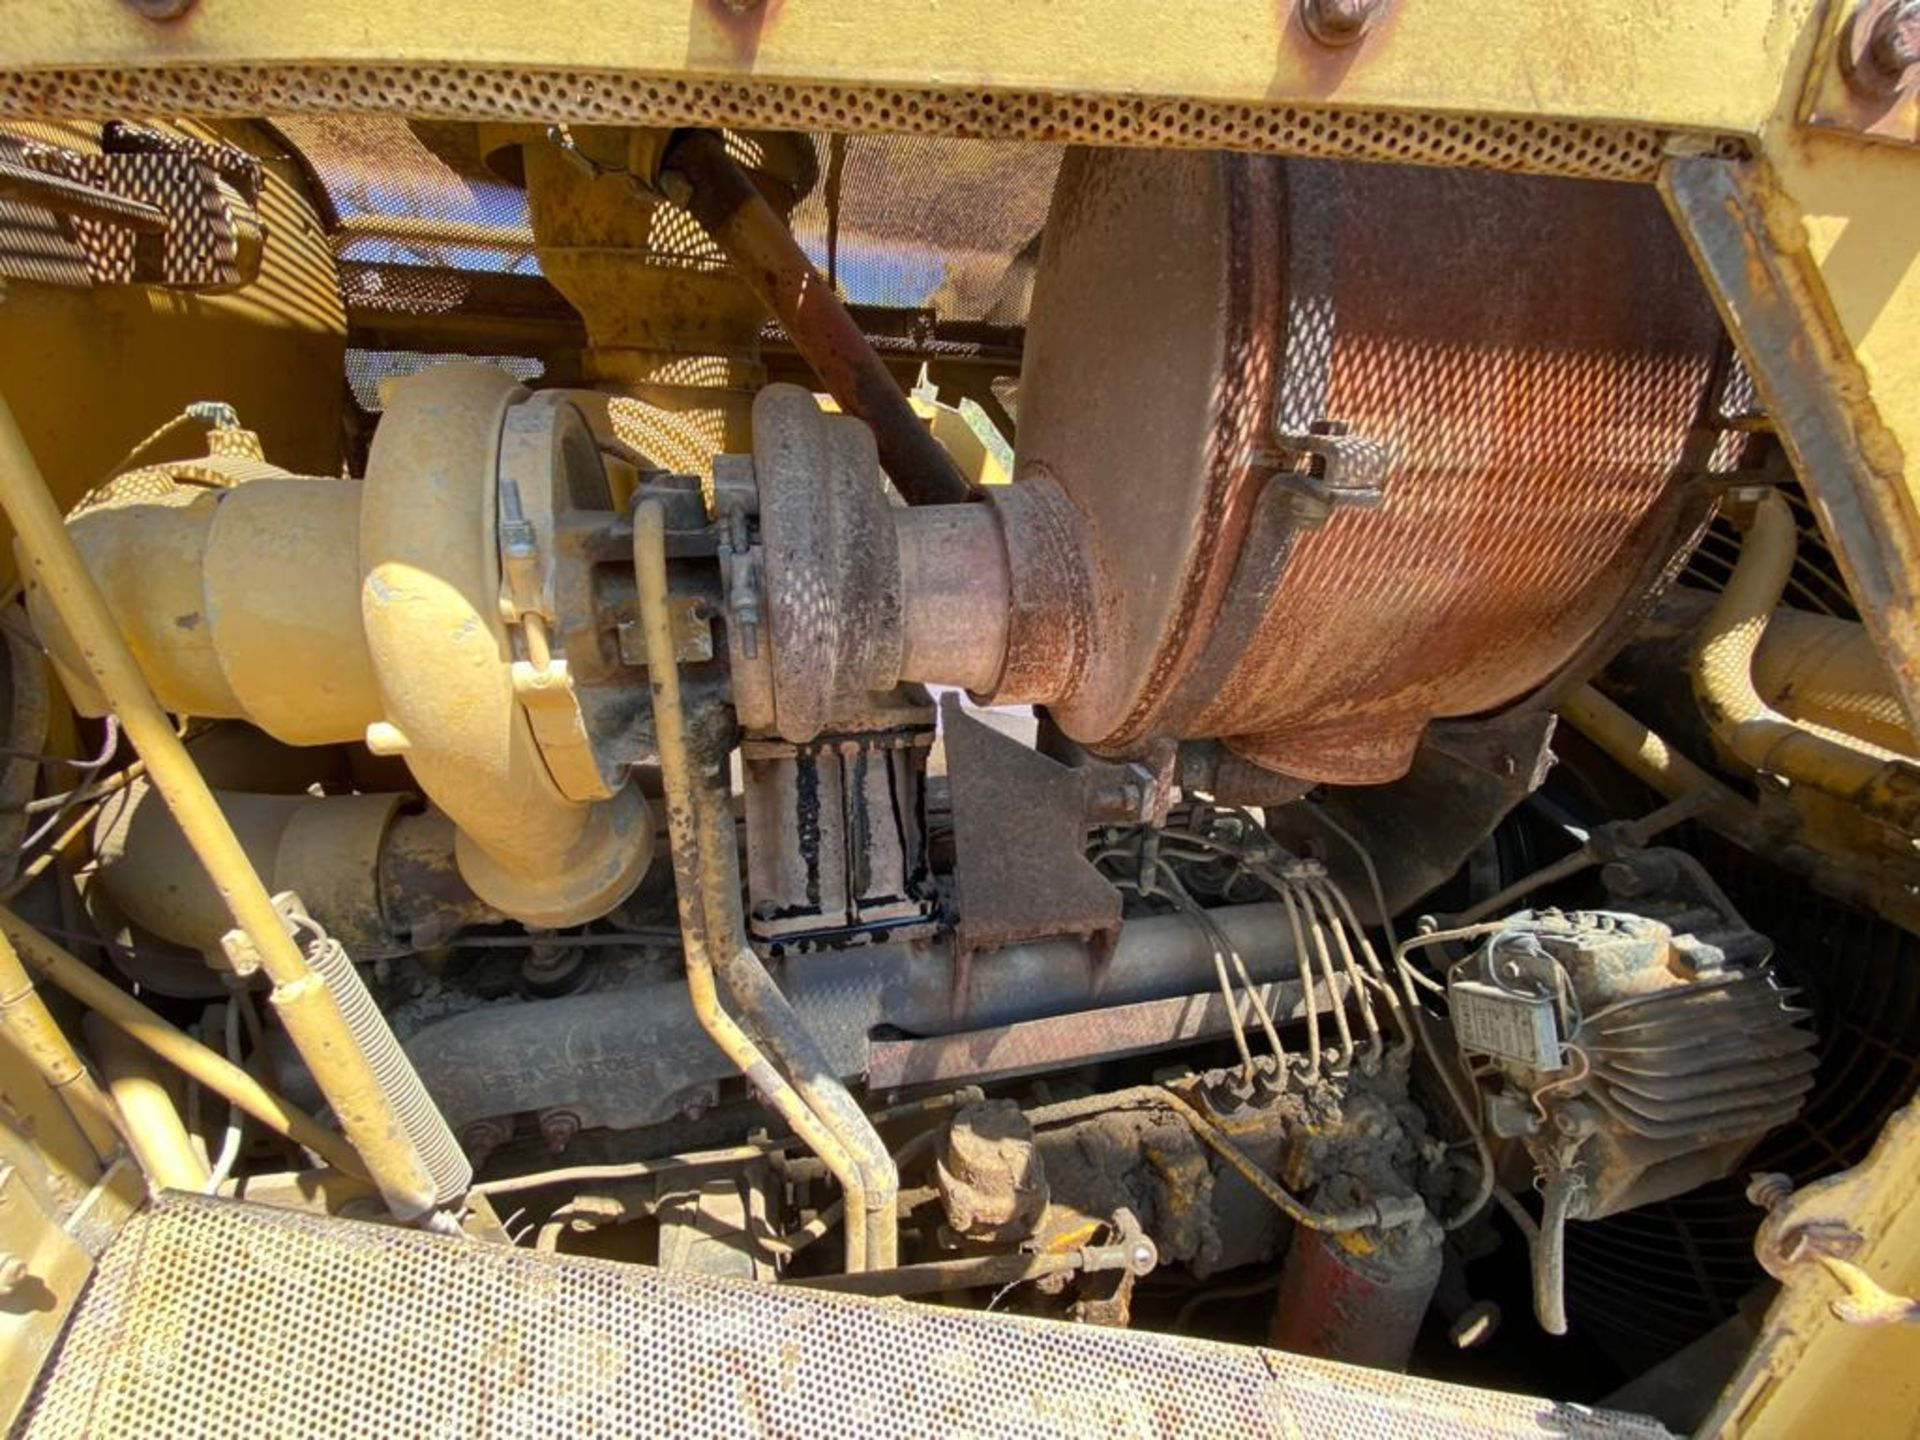 Caterpillar D7G Bulldozer, Serial number 92V5897, Diesel motor - Image 38 of 48